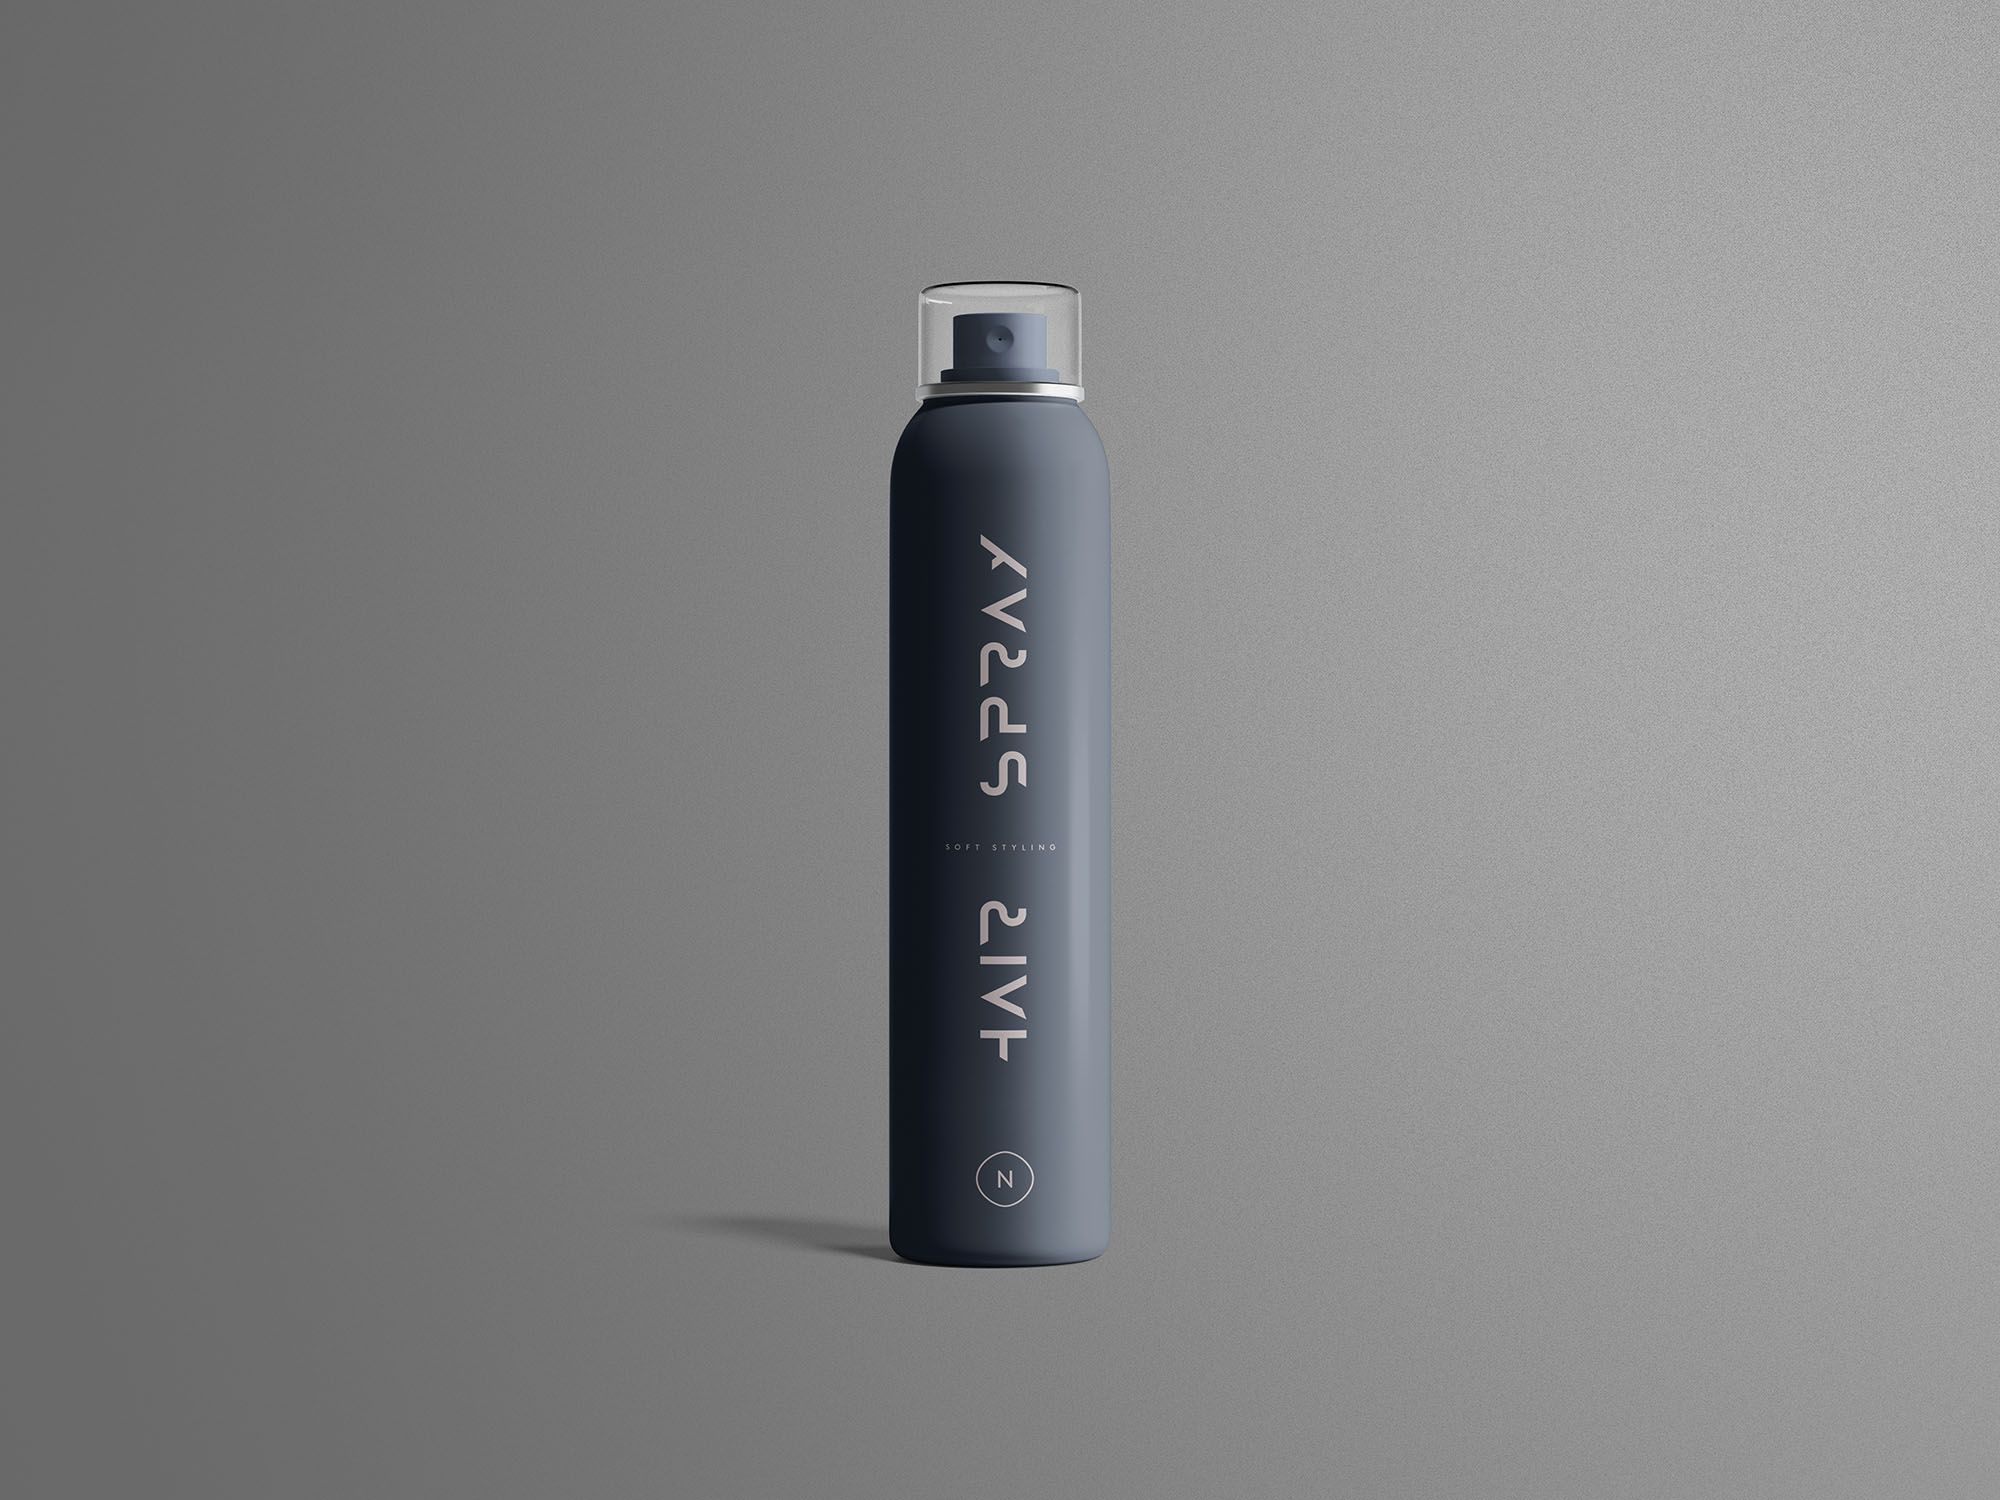 Hair Spray Bottle Psd Mockup For Free Hair Spray Bottle Spray Bottle Bottle Mockup